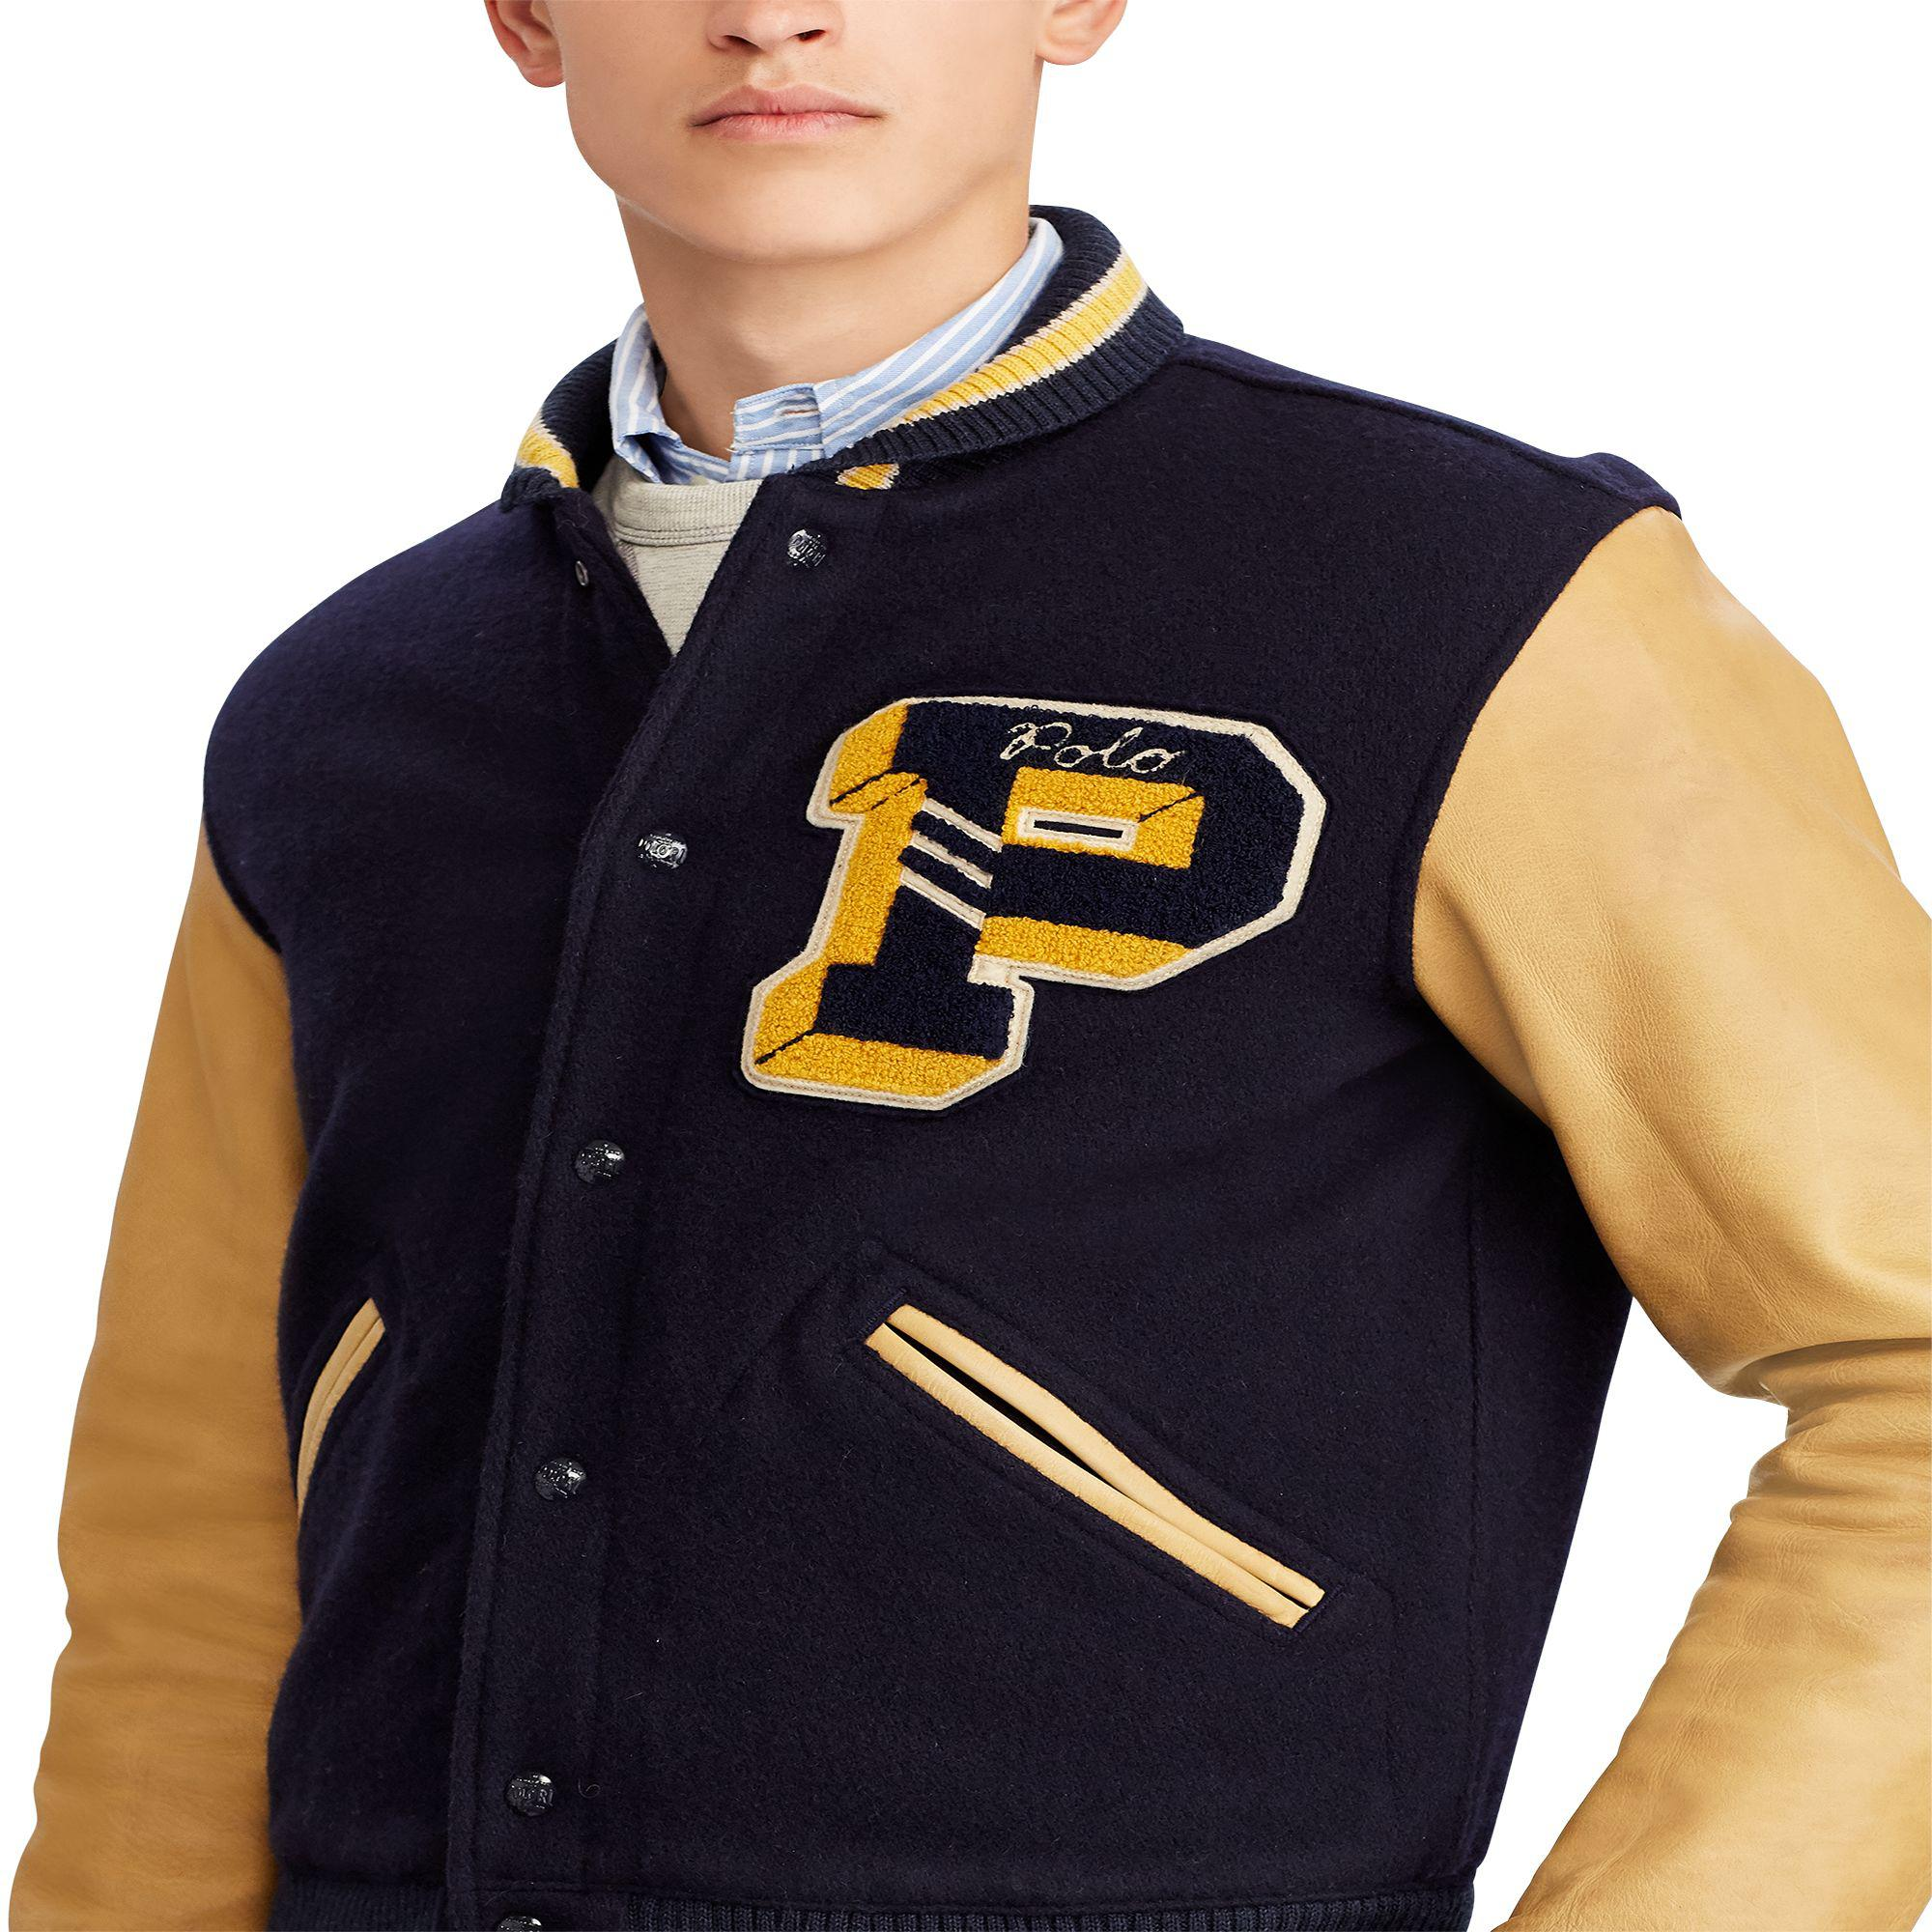 Polo Ralph Lauren Wool Varsity Jacket in Navy (Blue) for